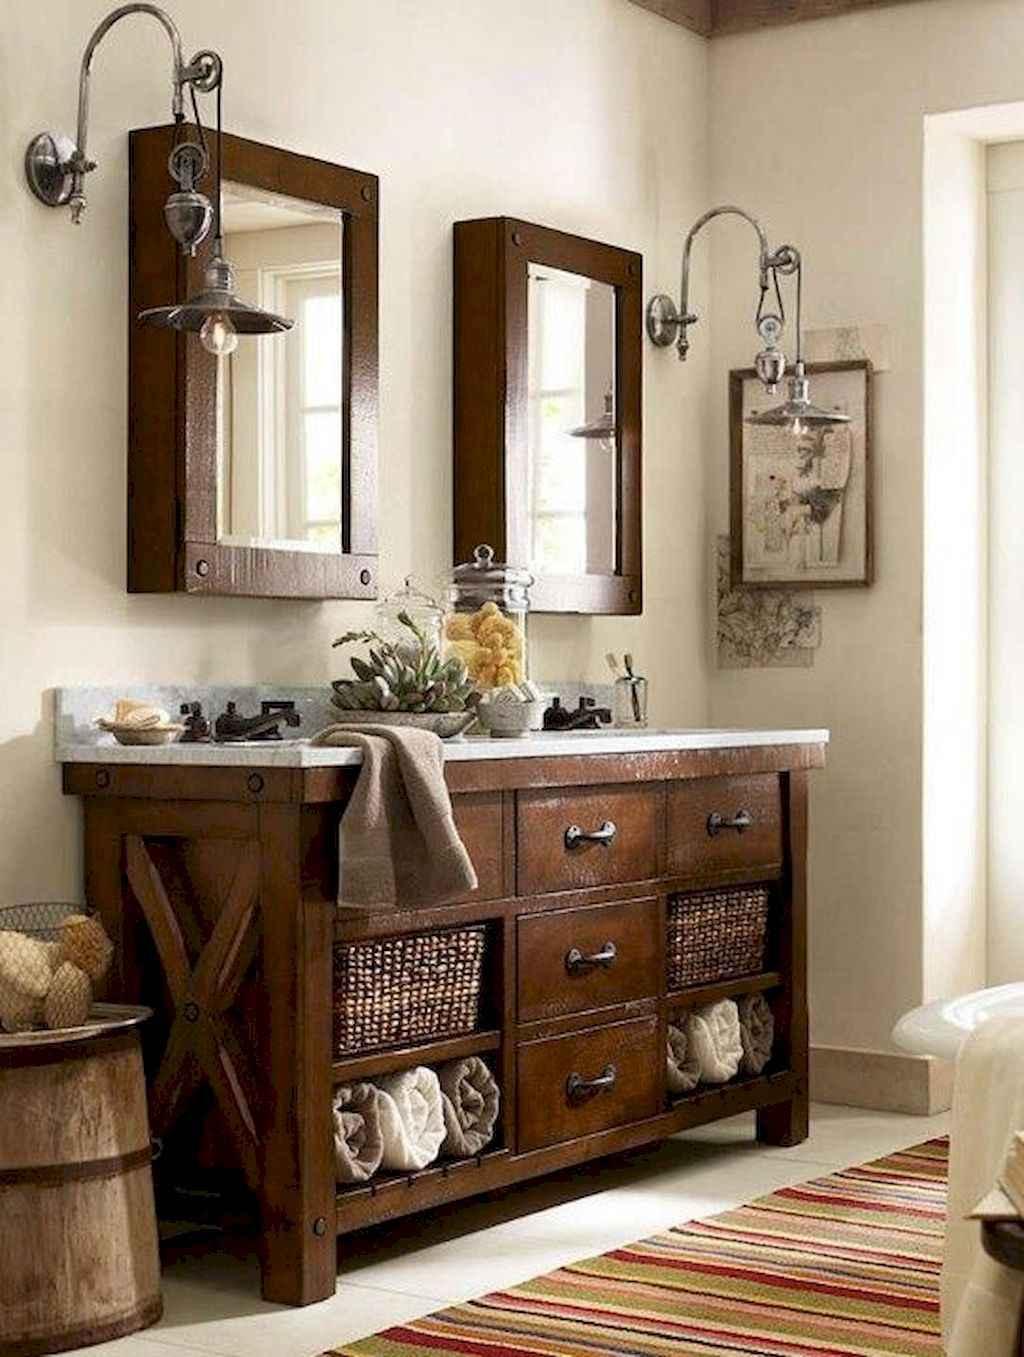 125 awesome farmhouse bathroom vanity remodel ideas (15)